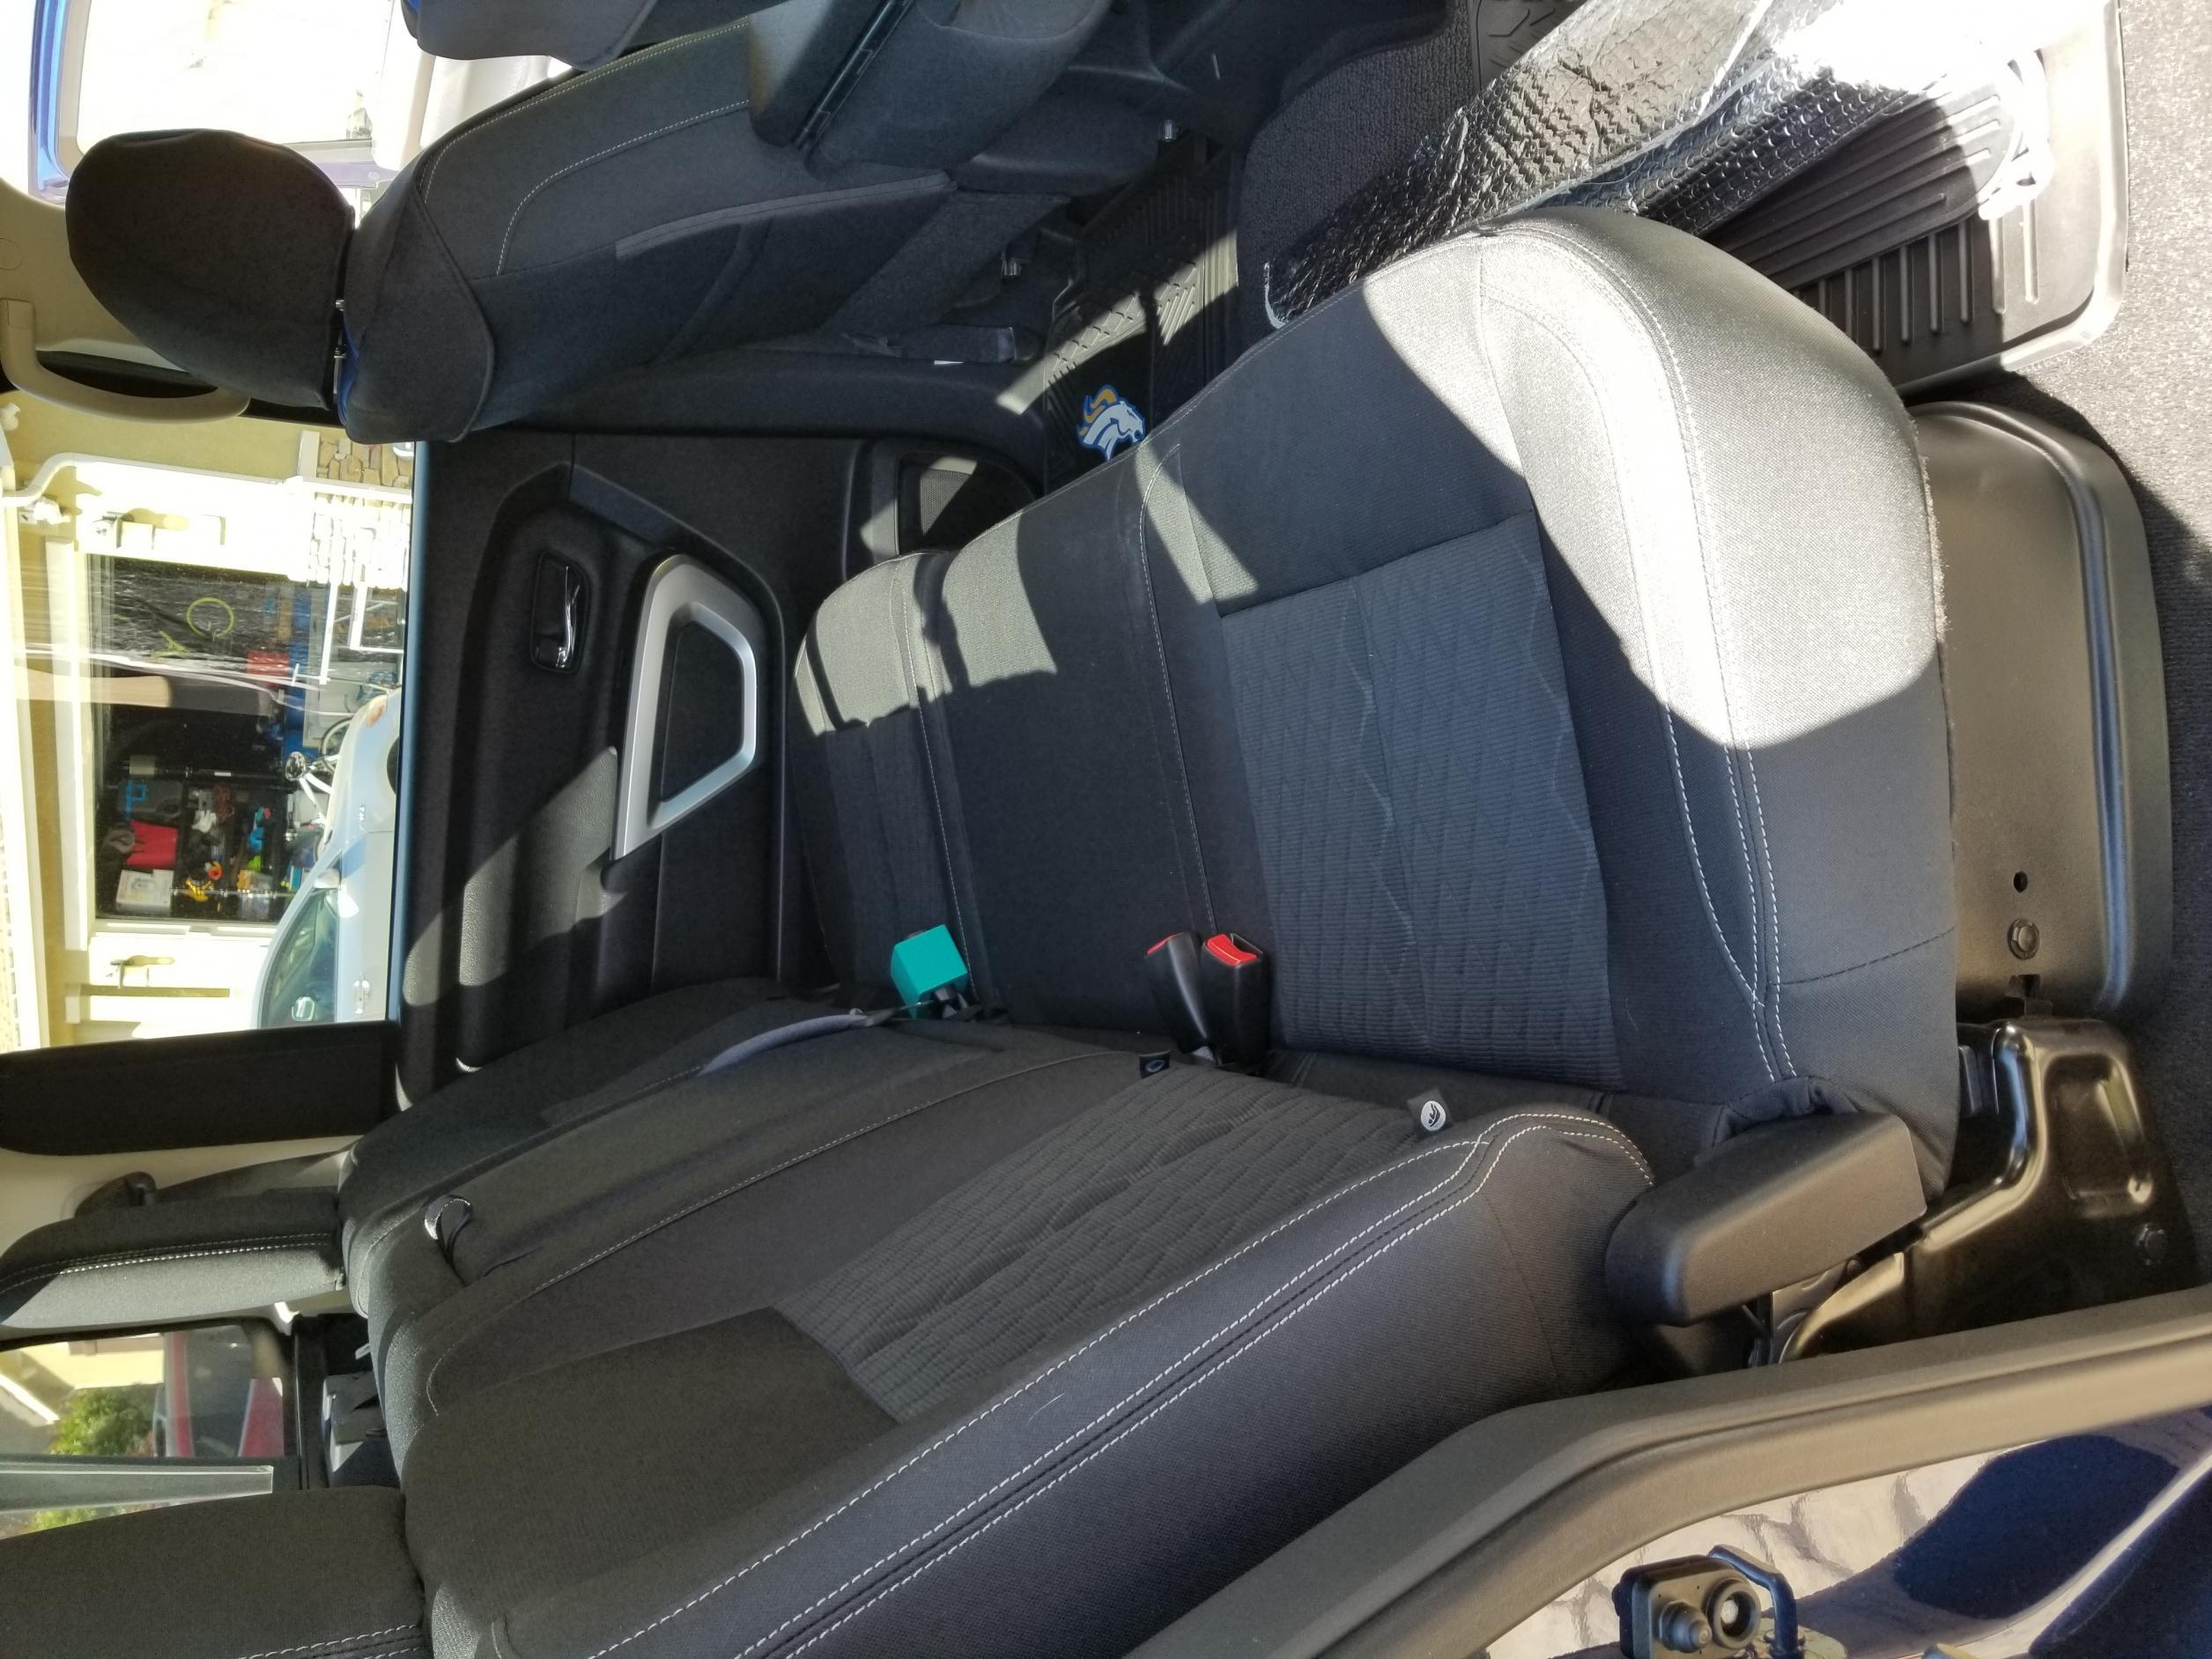 Seat Covers-20190607_164755.jpg